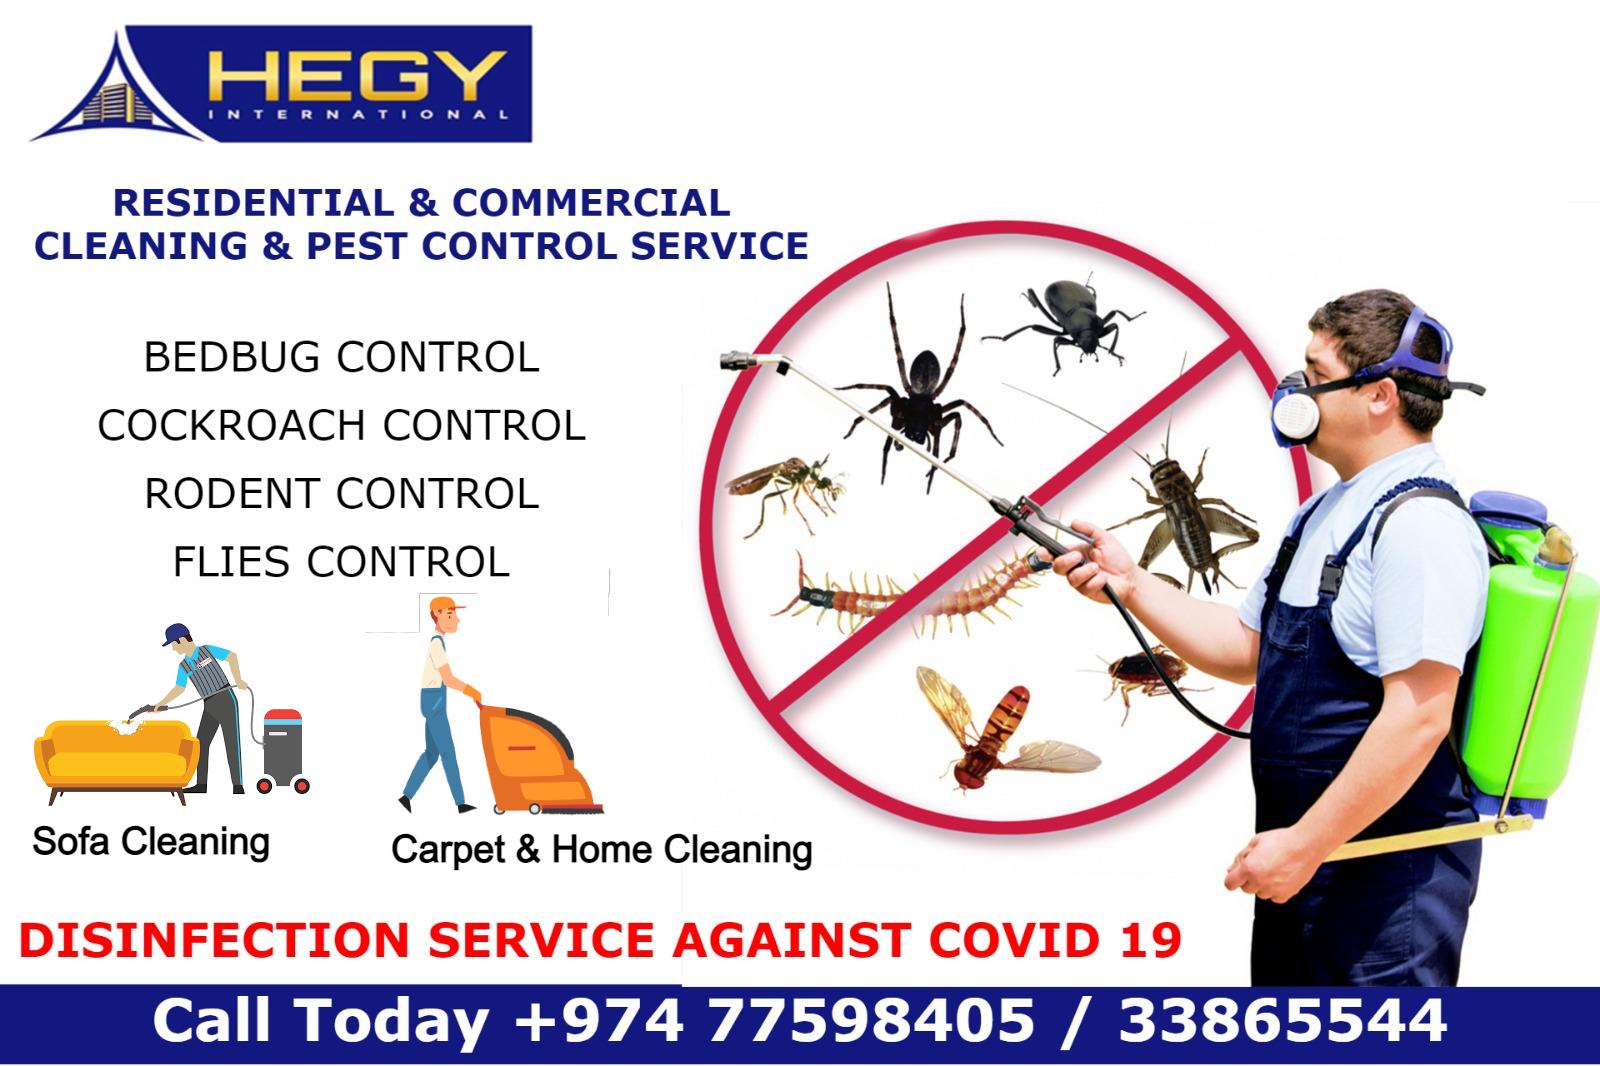 Pest Control - Cleaning Service - Sanitation Servi